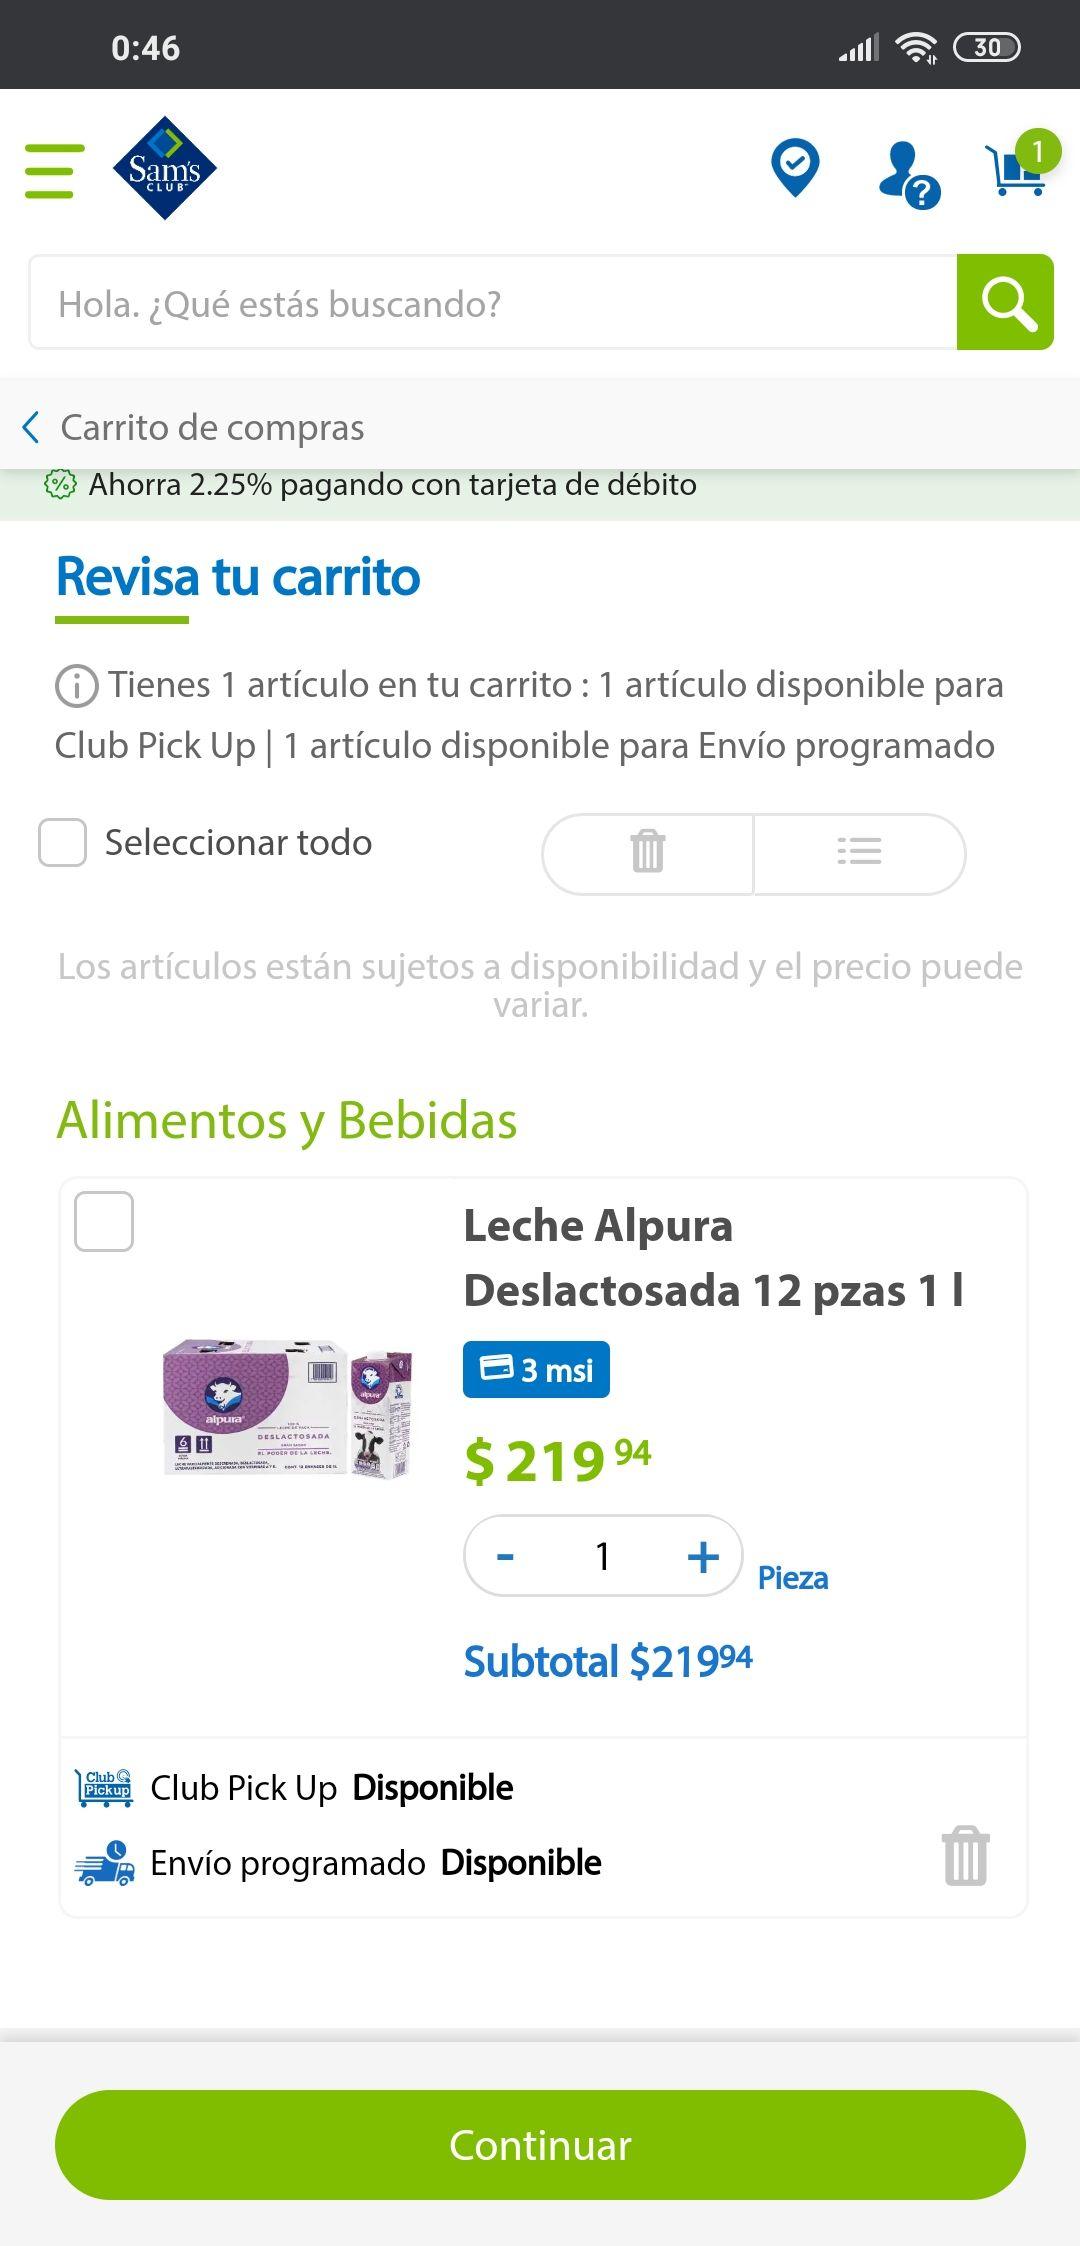 Sam's Club: Leche Alpura Deslactosada, 220.00 caja 12 litros.